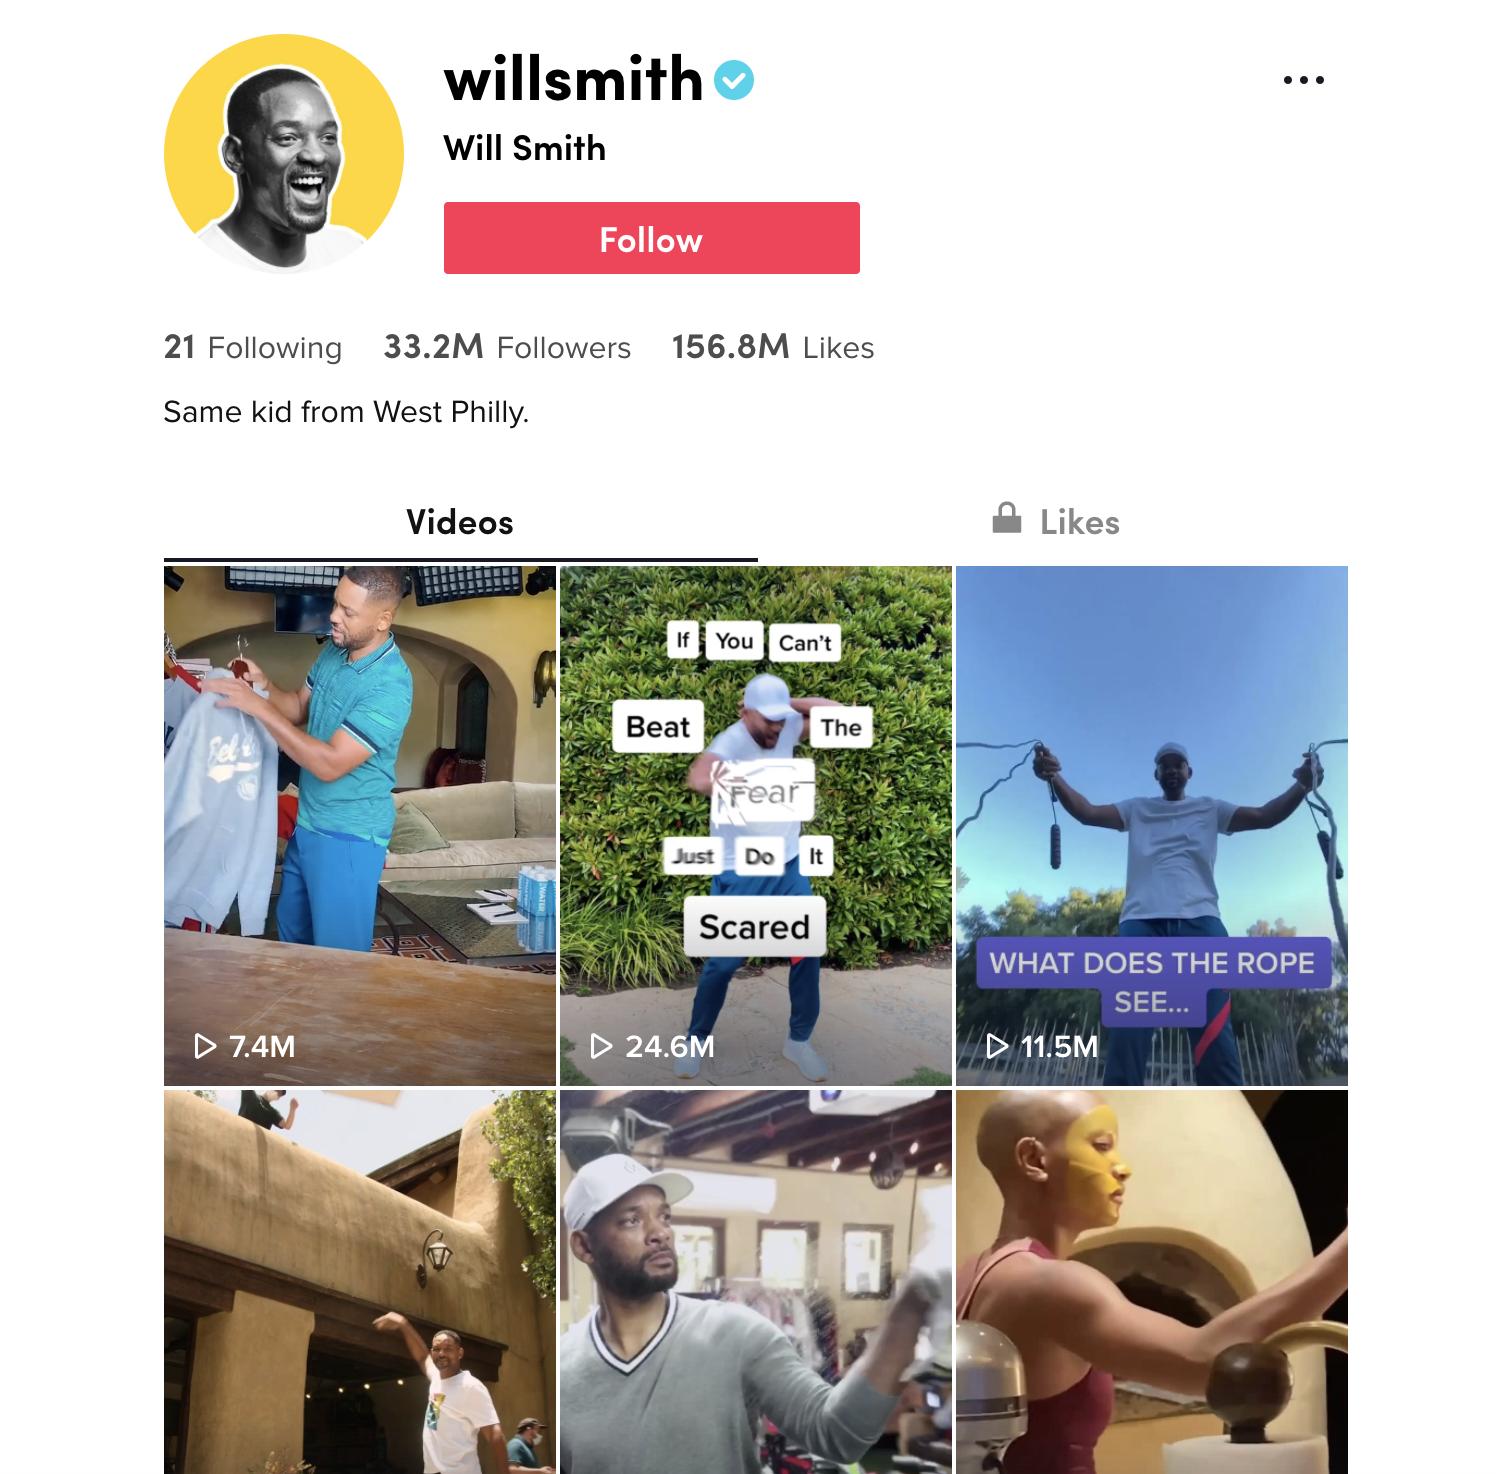 Will Smith's TikTok Account (Screenshot) Example of Using TikTok for Blog Marketing